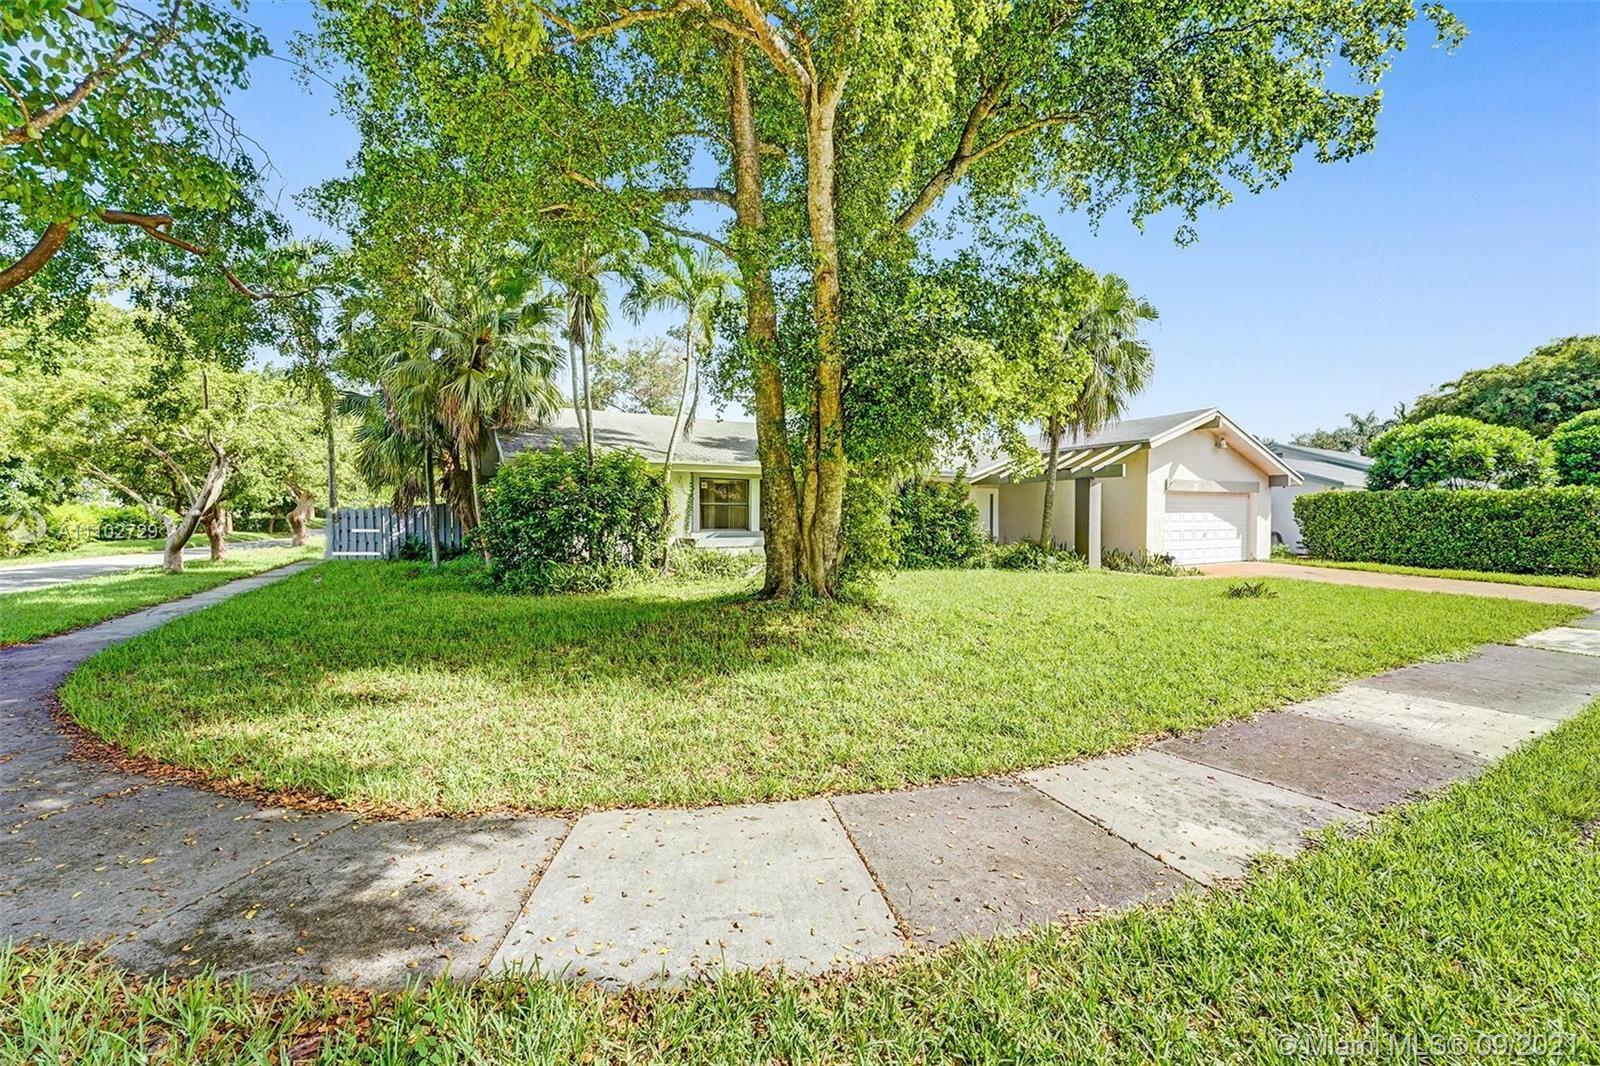 Single Family Home,For Sale,11621 SW 105th Ter, Miami, Florida 33176,Brickell,realty,broker,condos near me